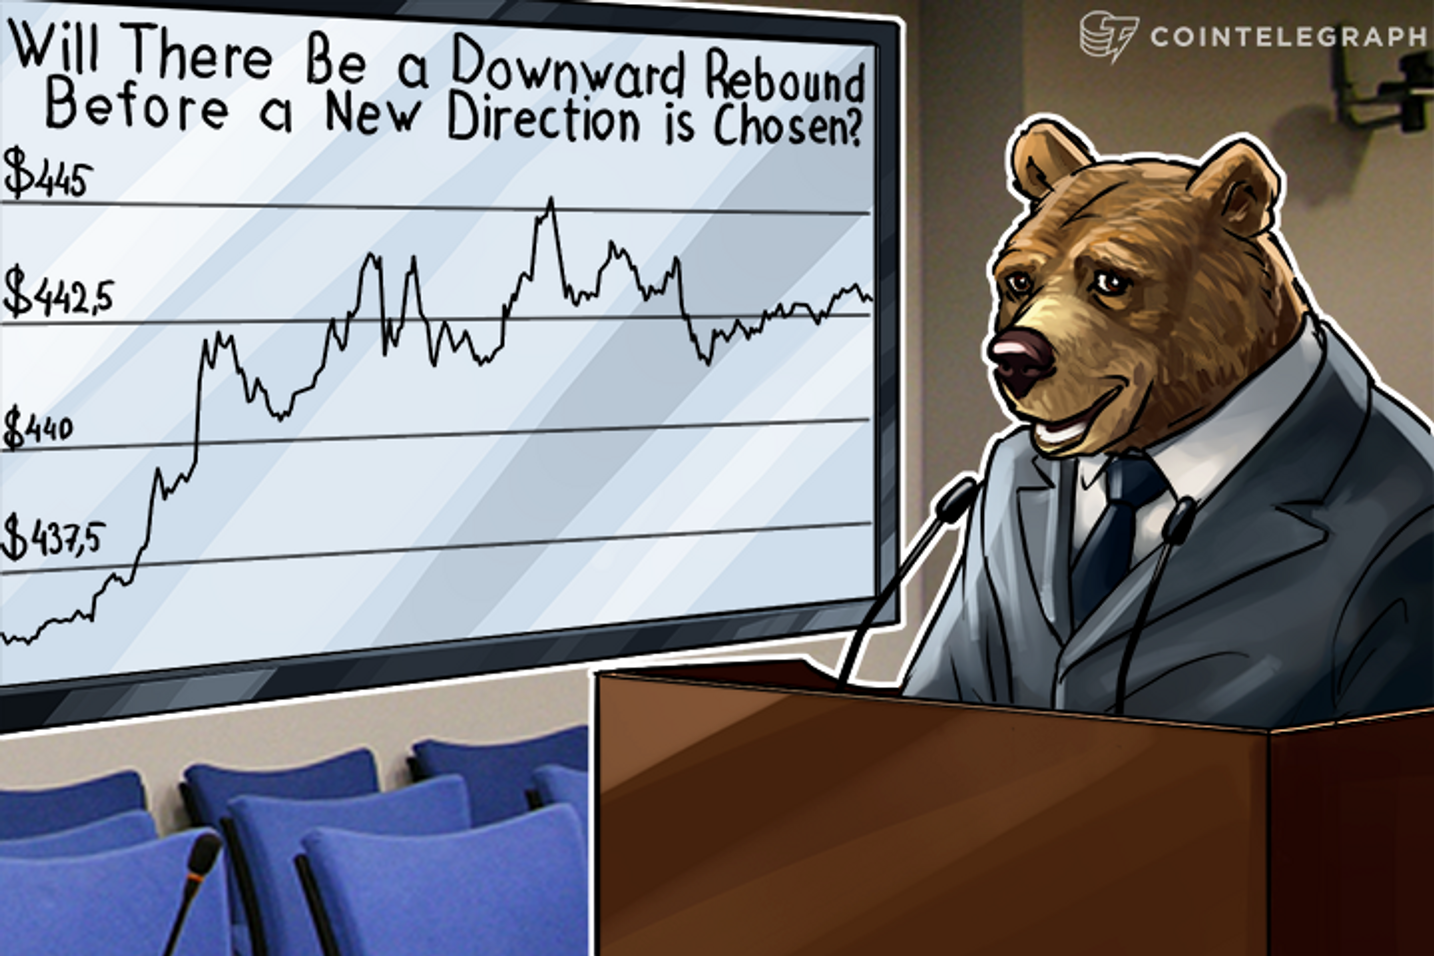 Bitcoin Price Analysis: 4/21/2016